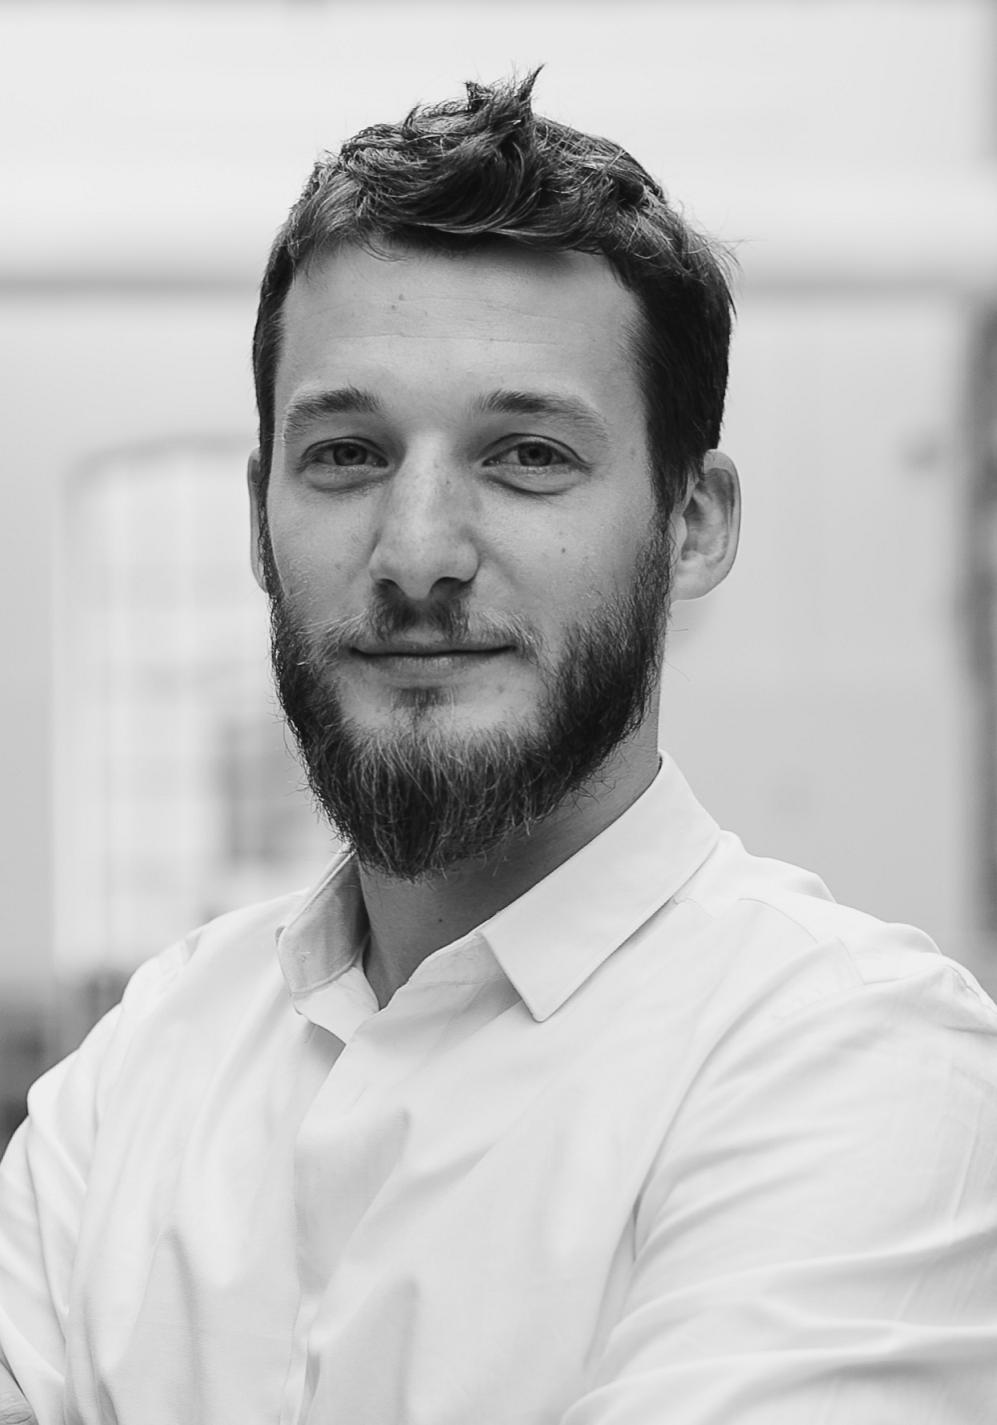 Michał Polak - Quotiss sales automation tools - Co-founder, CTO